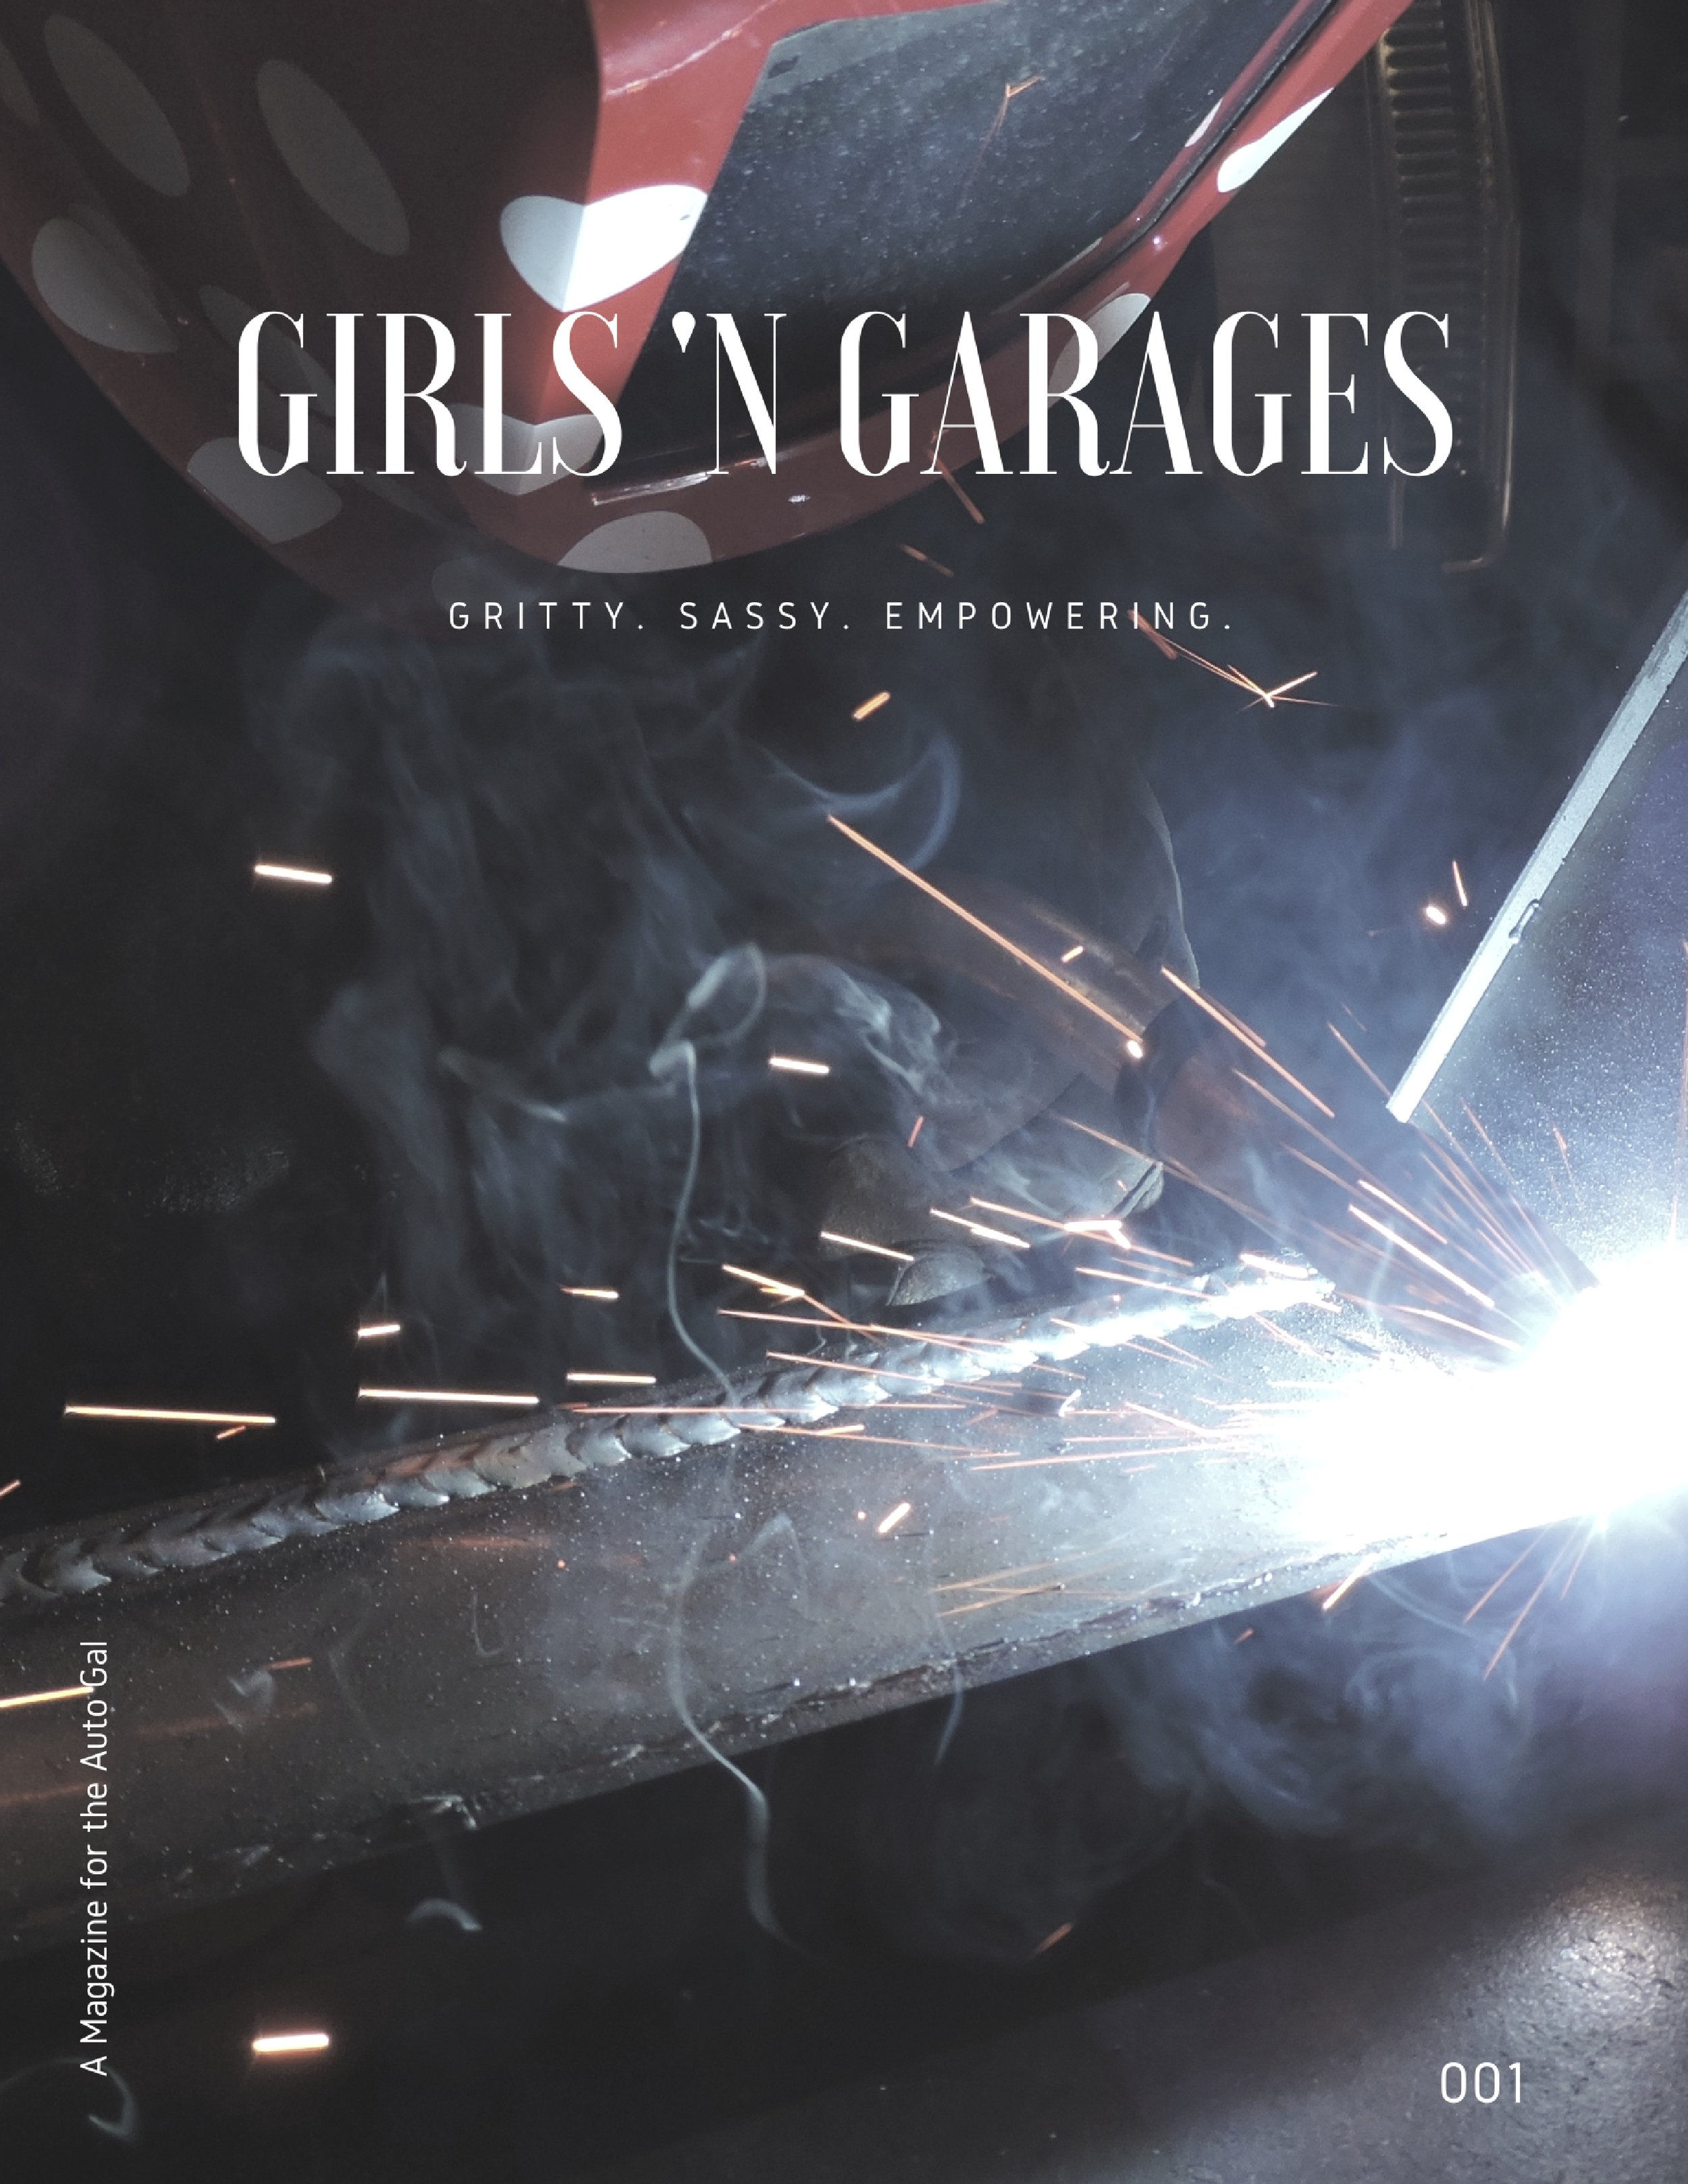 Girls 'N Garages (1).jpg